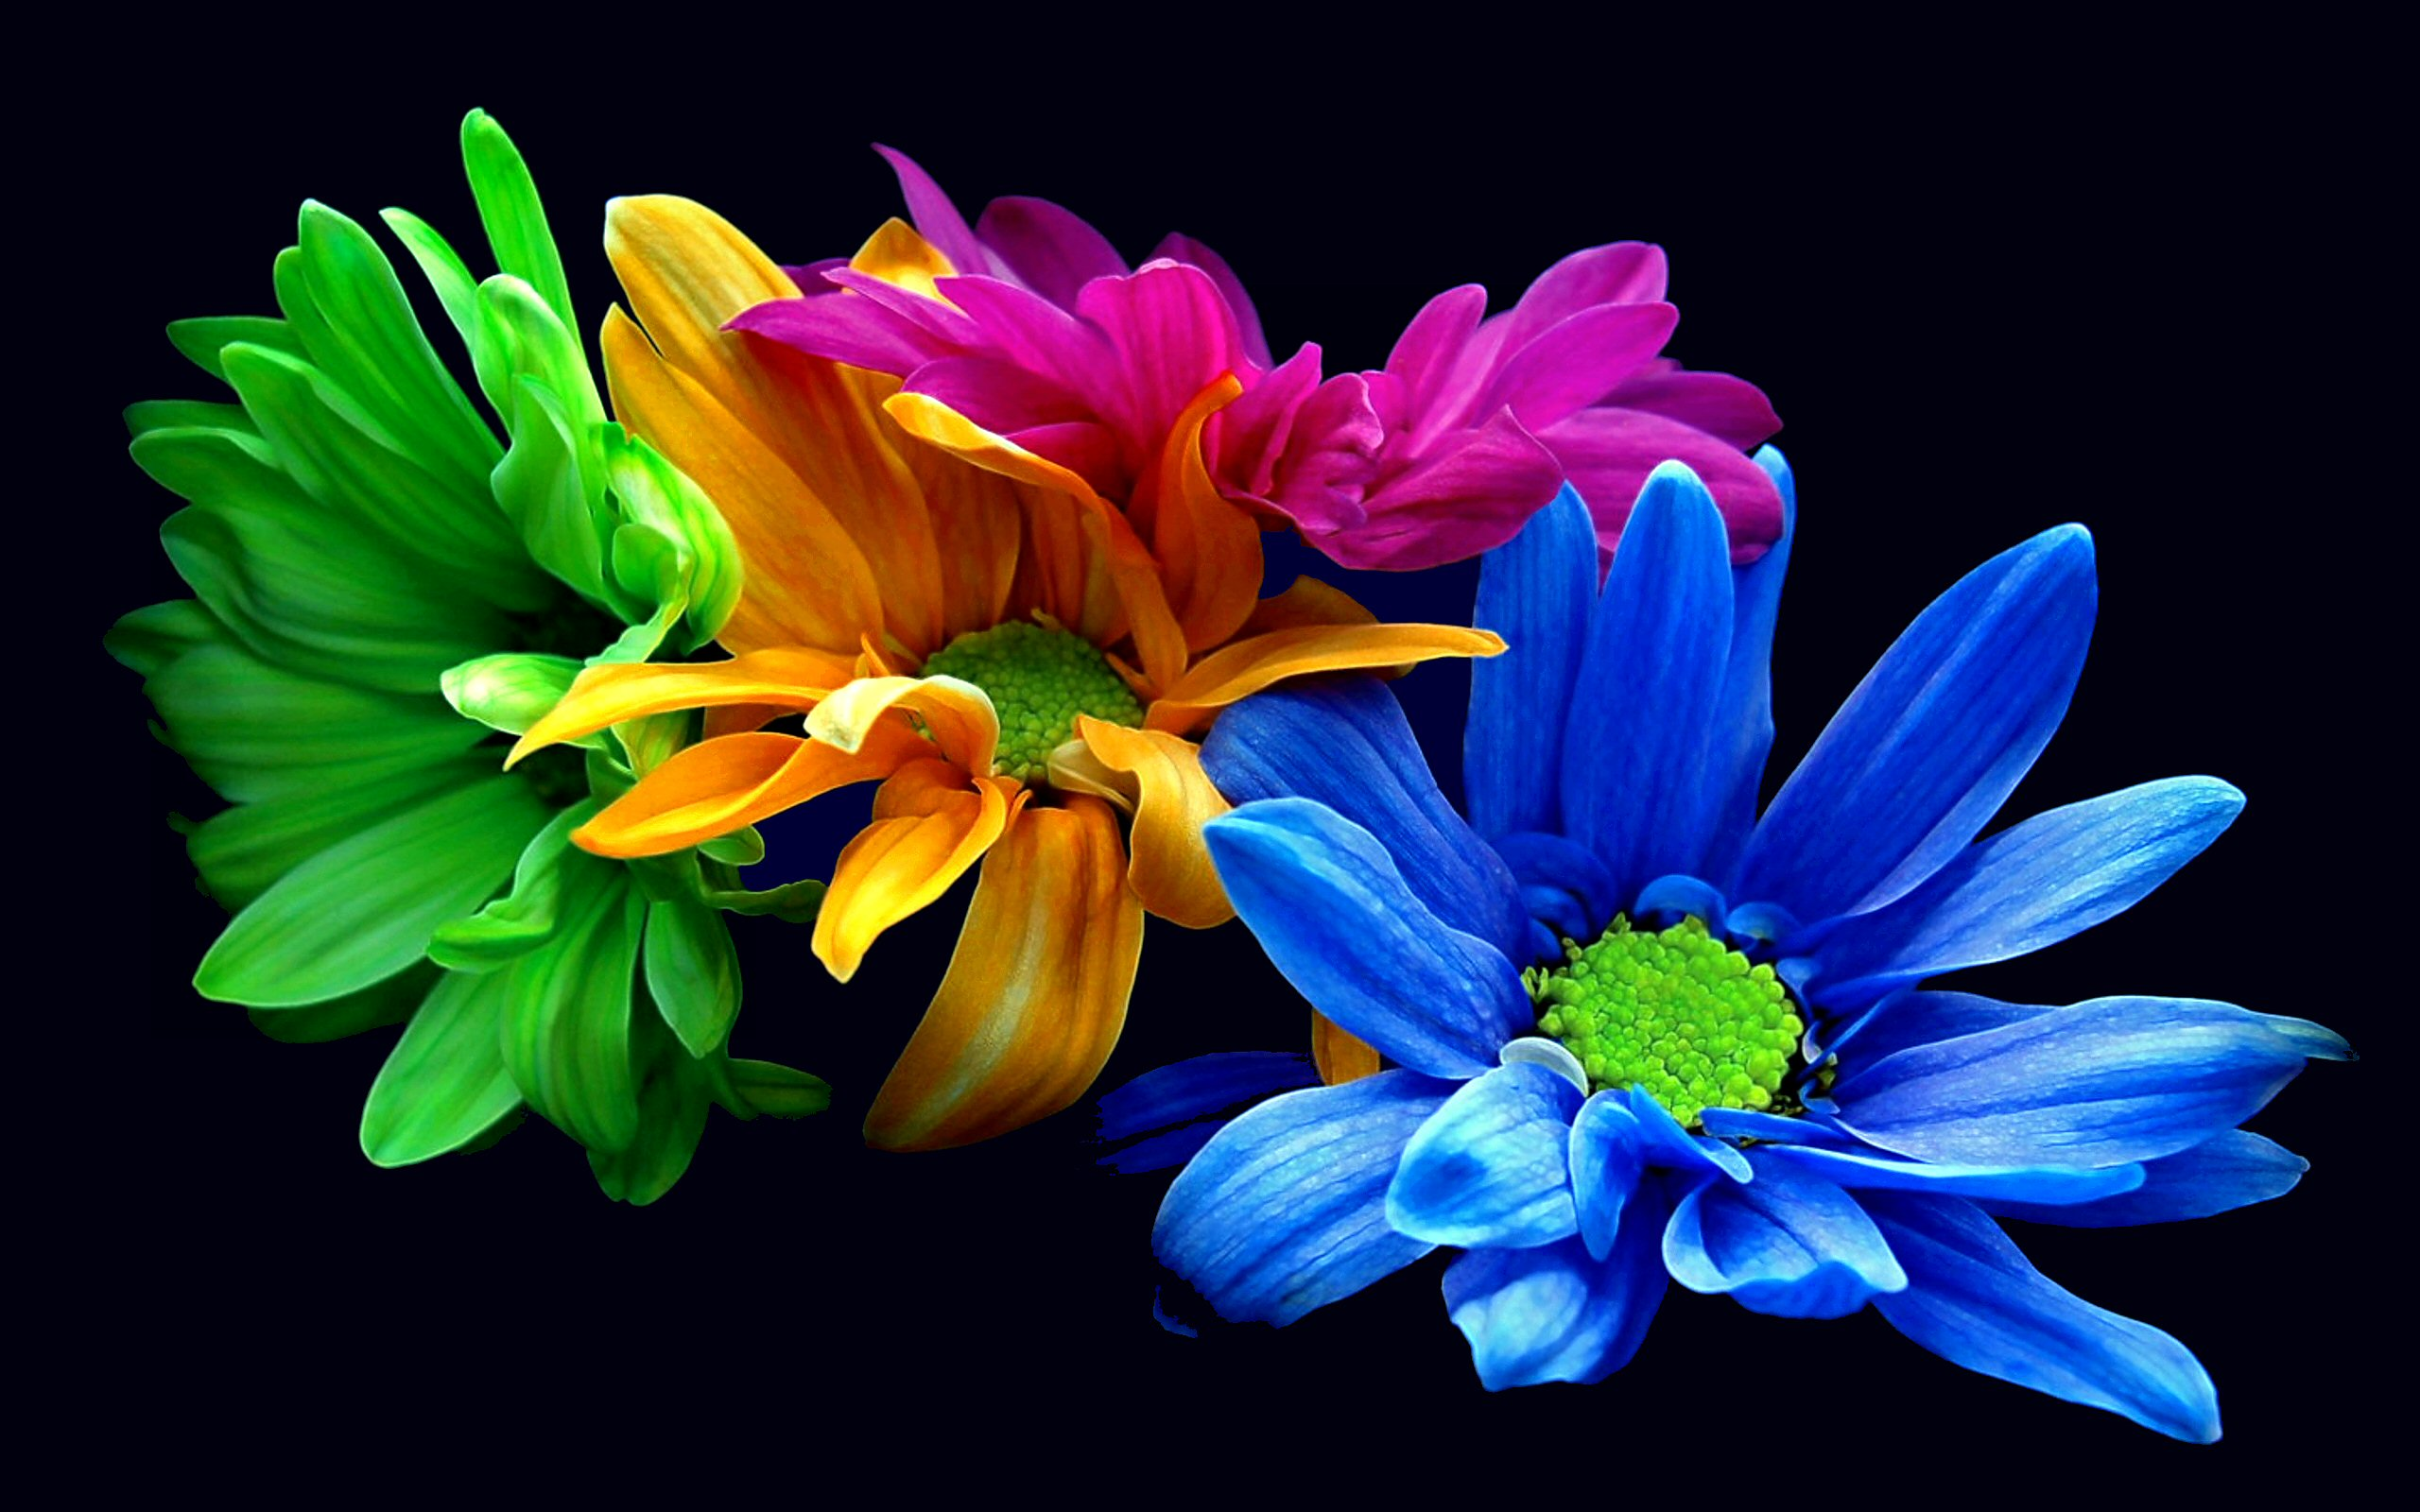 Flower Hd Wallpaper Colors